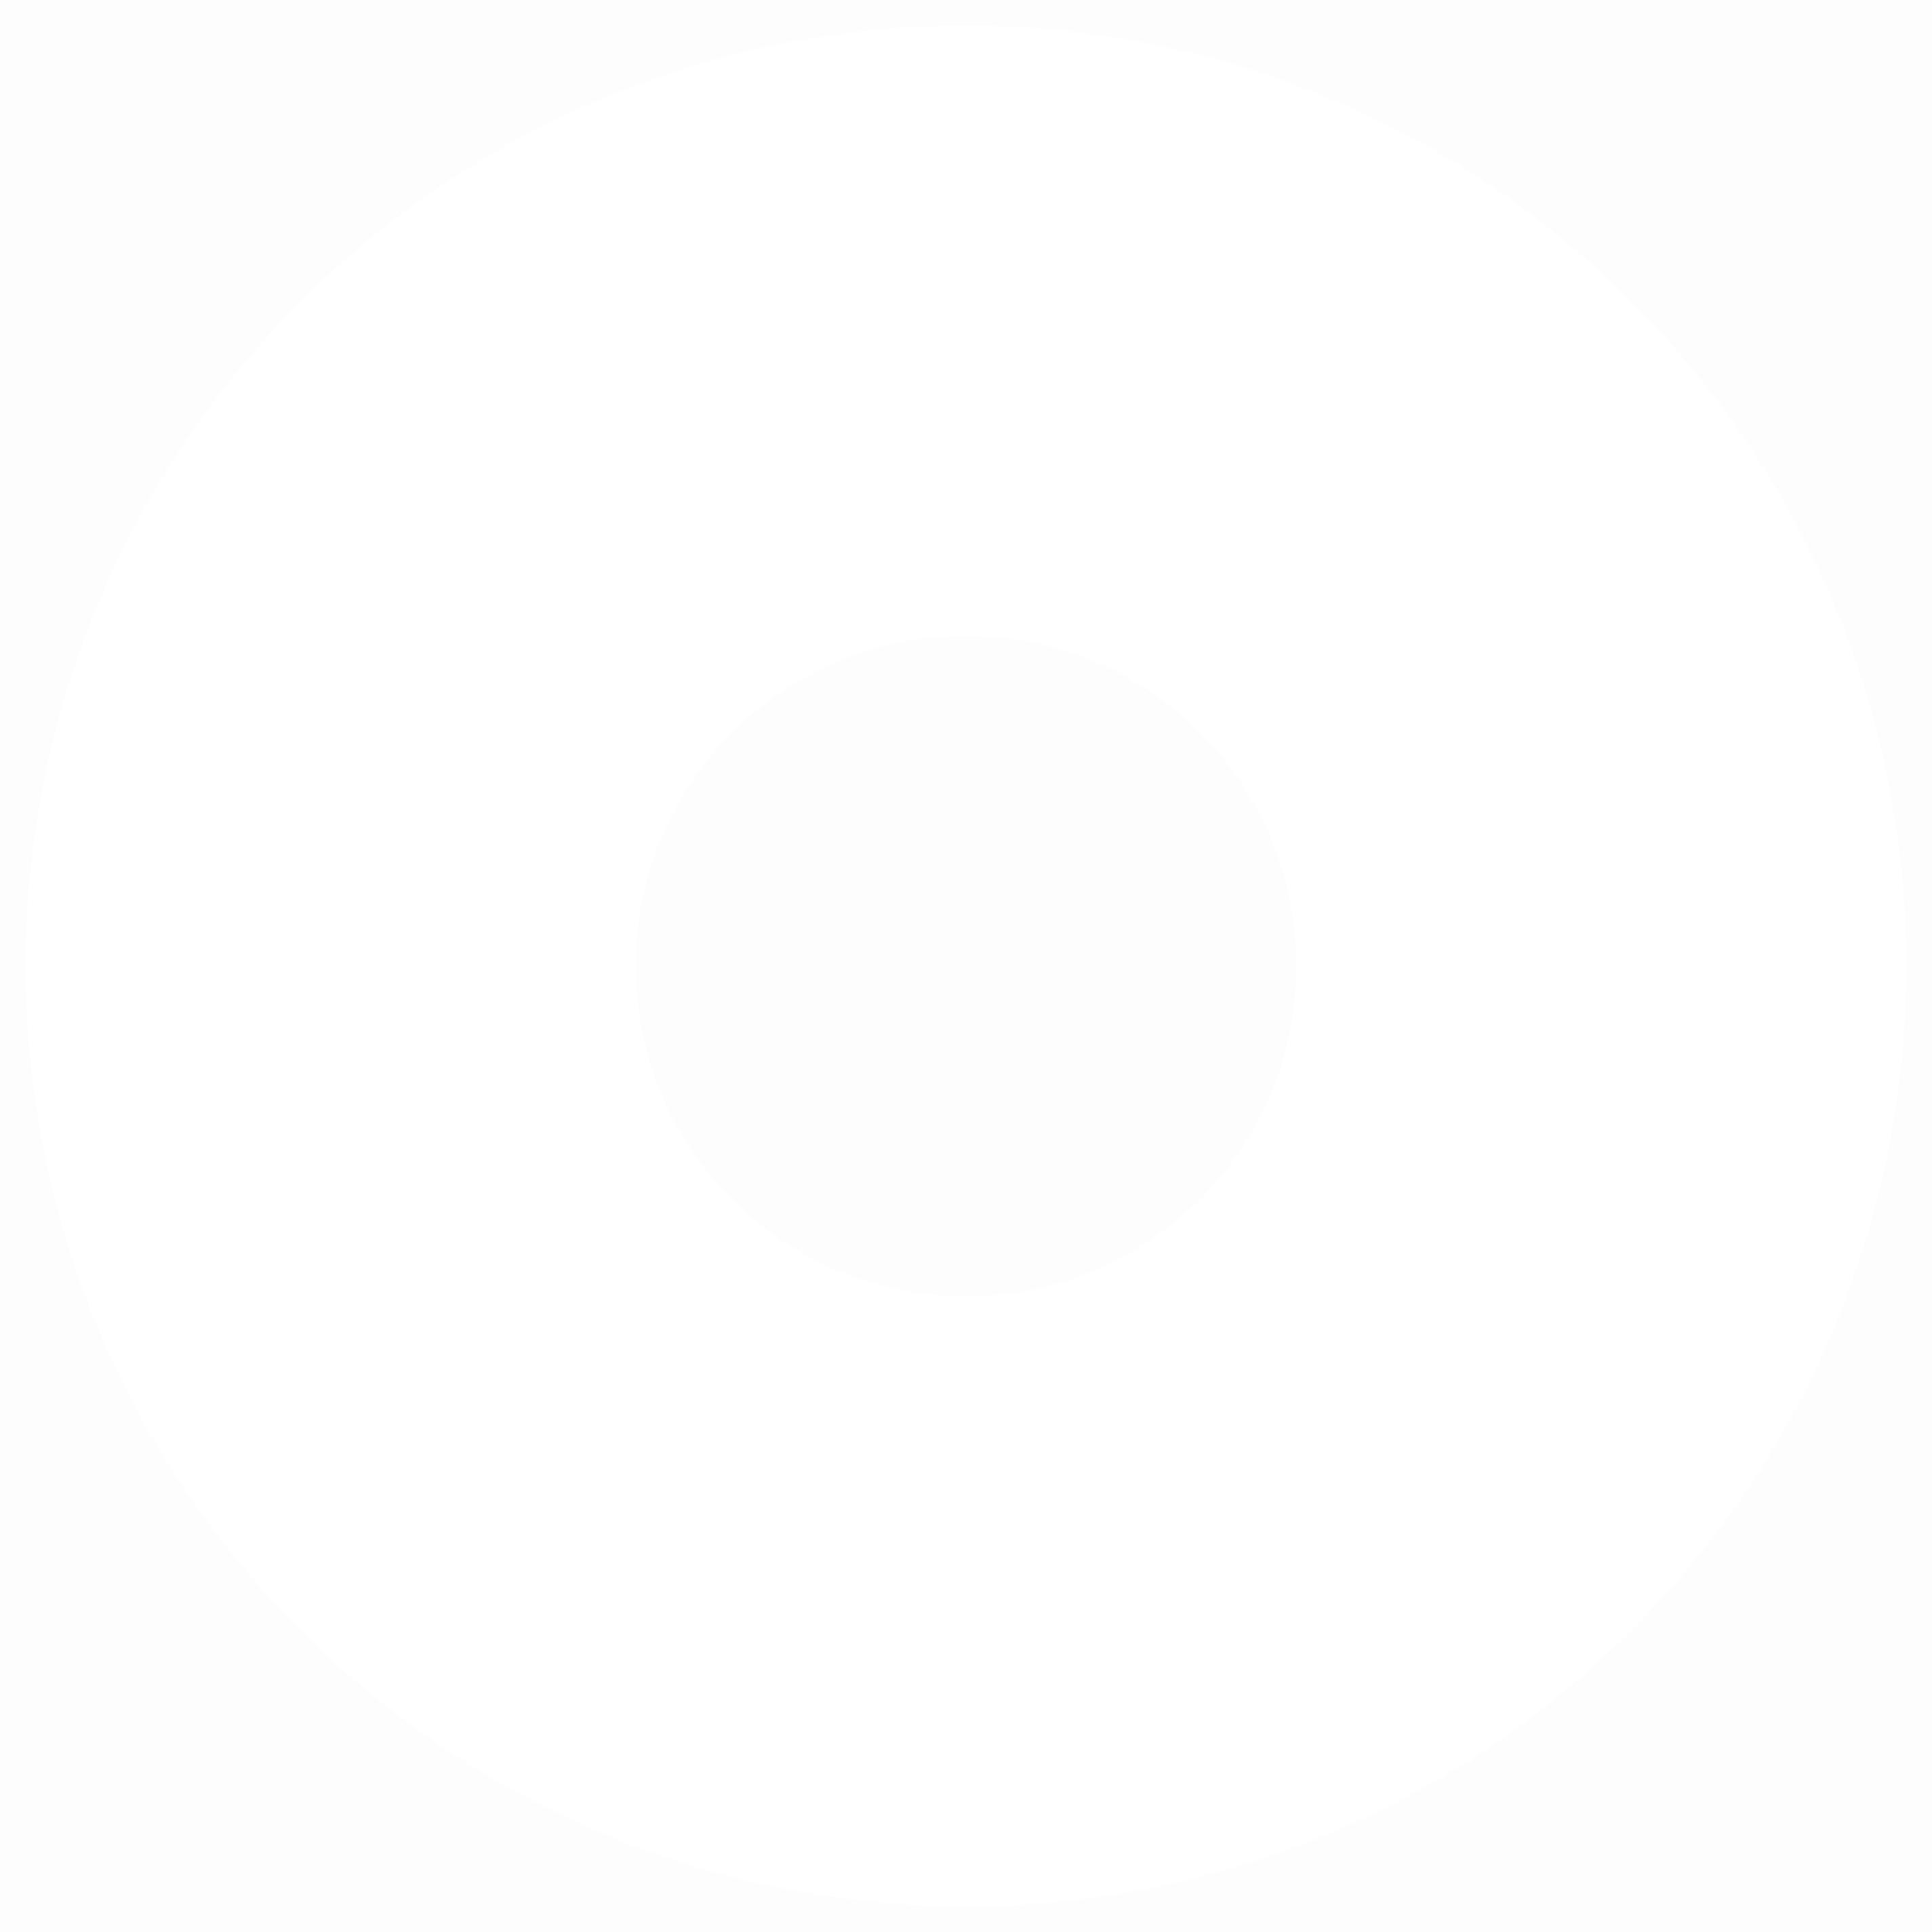 Cd Label Template Photoshop Luxury 5 Best Of Memorex Cd Label Shop Template Cd